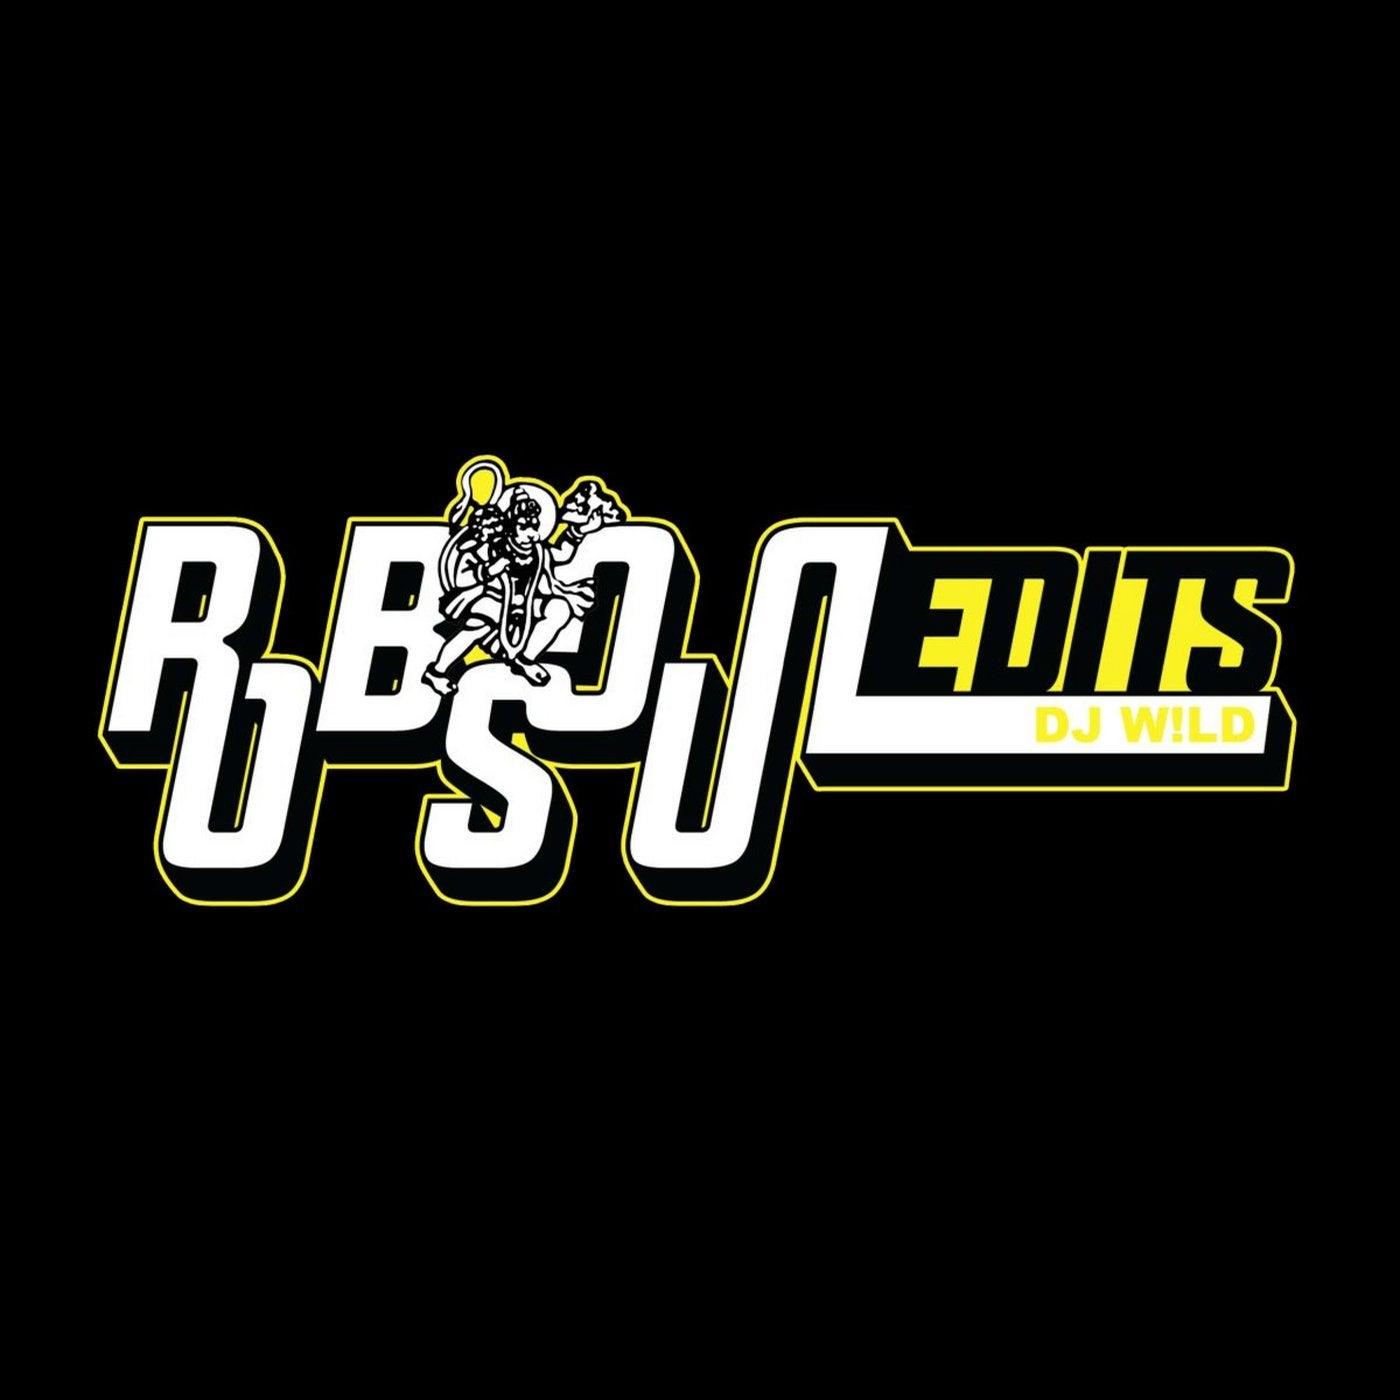 Lili's Theme (DJ W!Ld Remix)